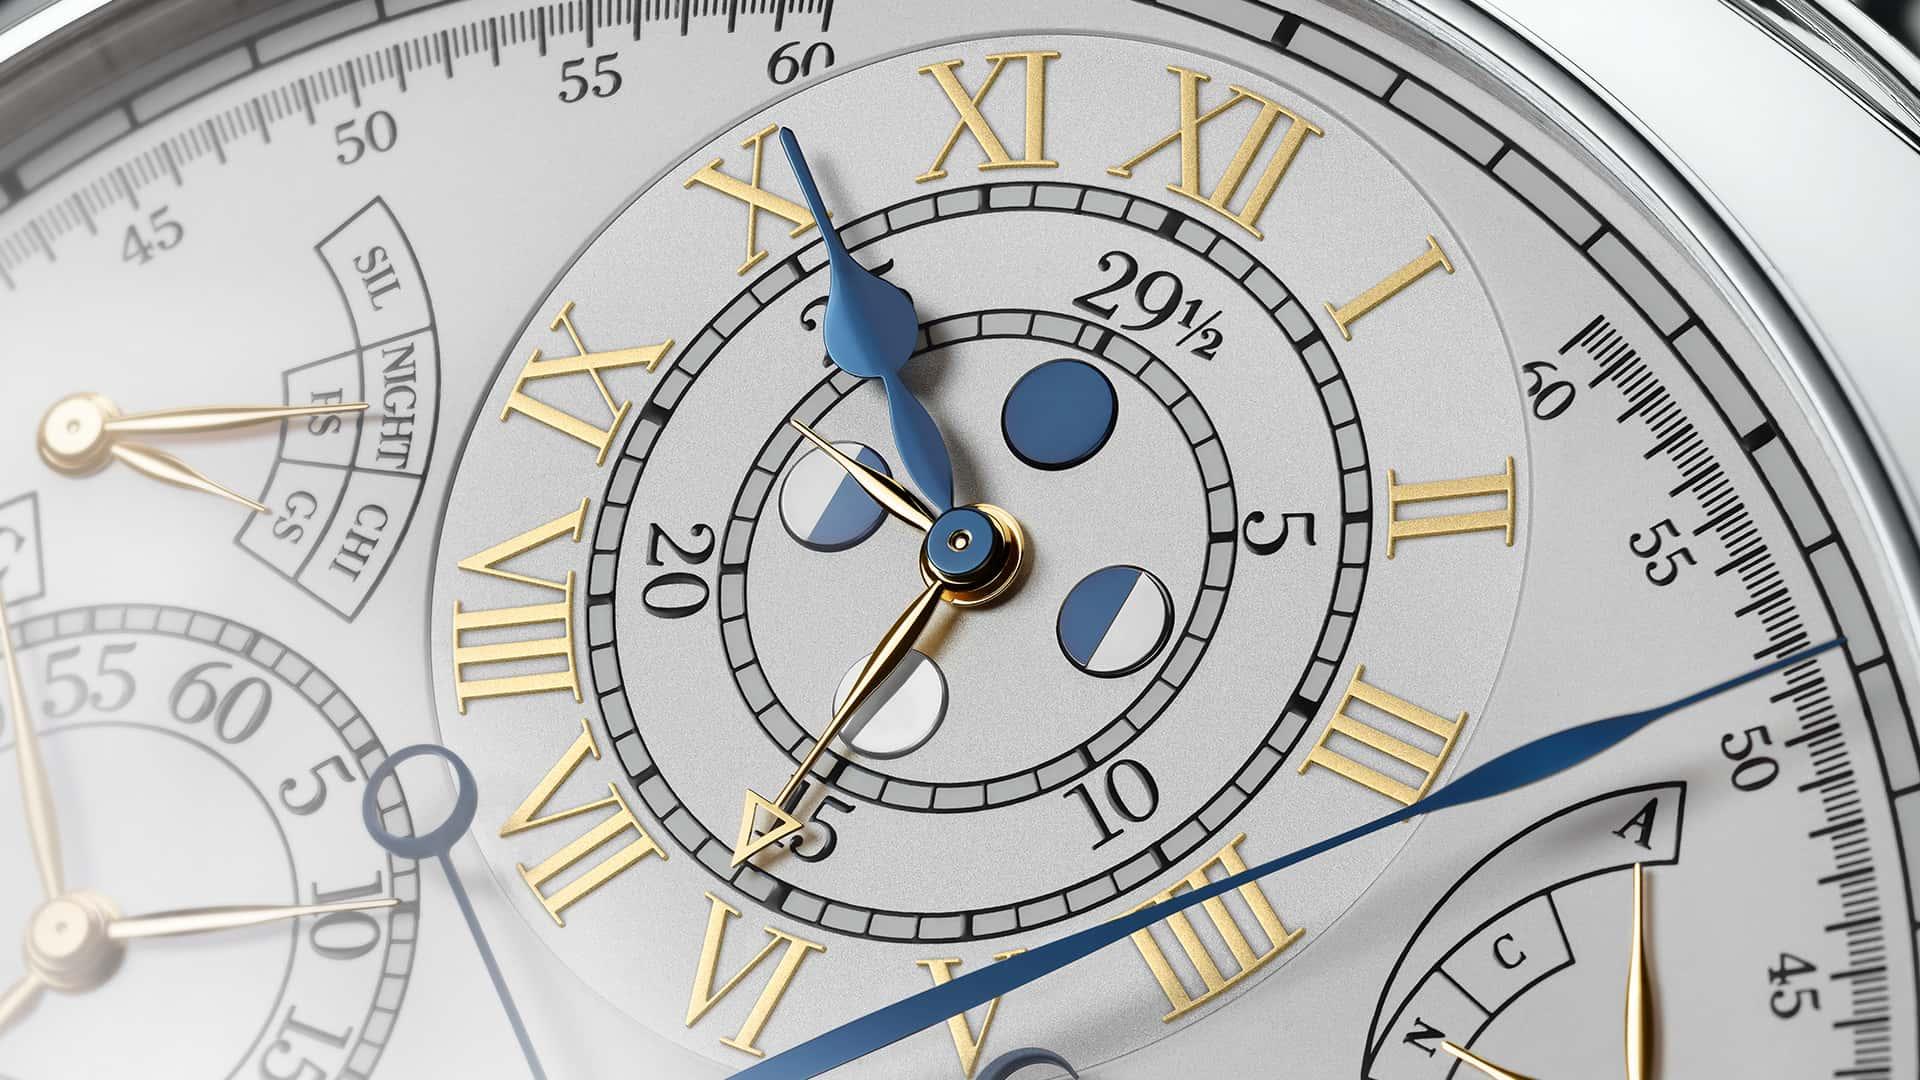 Vacheron Constantin Reference 57260 Tivoli anverso horas